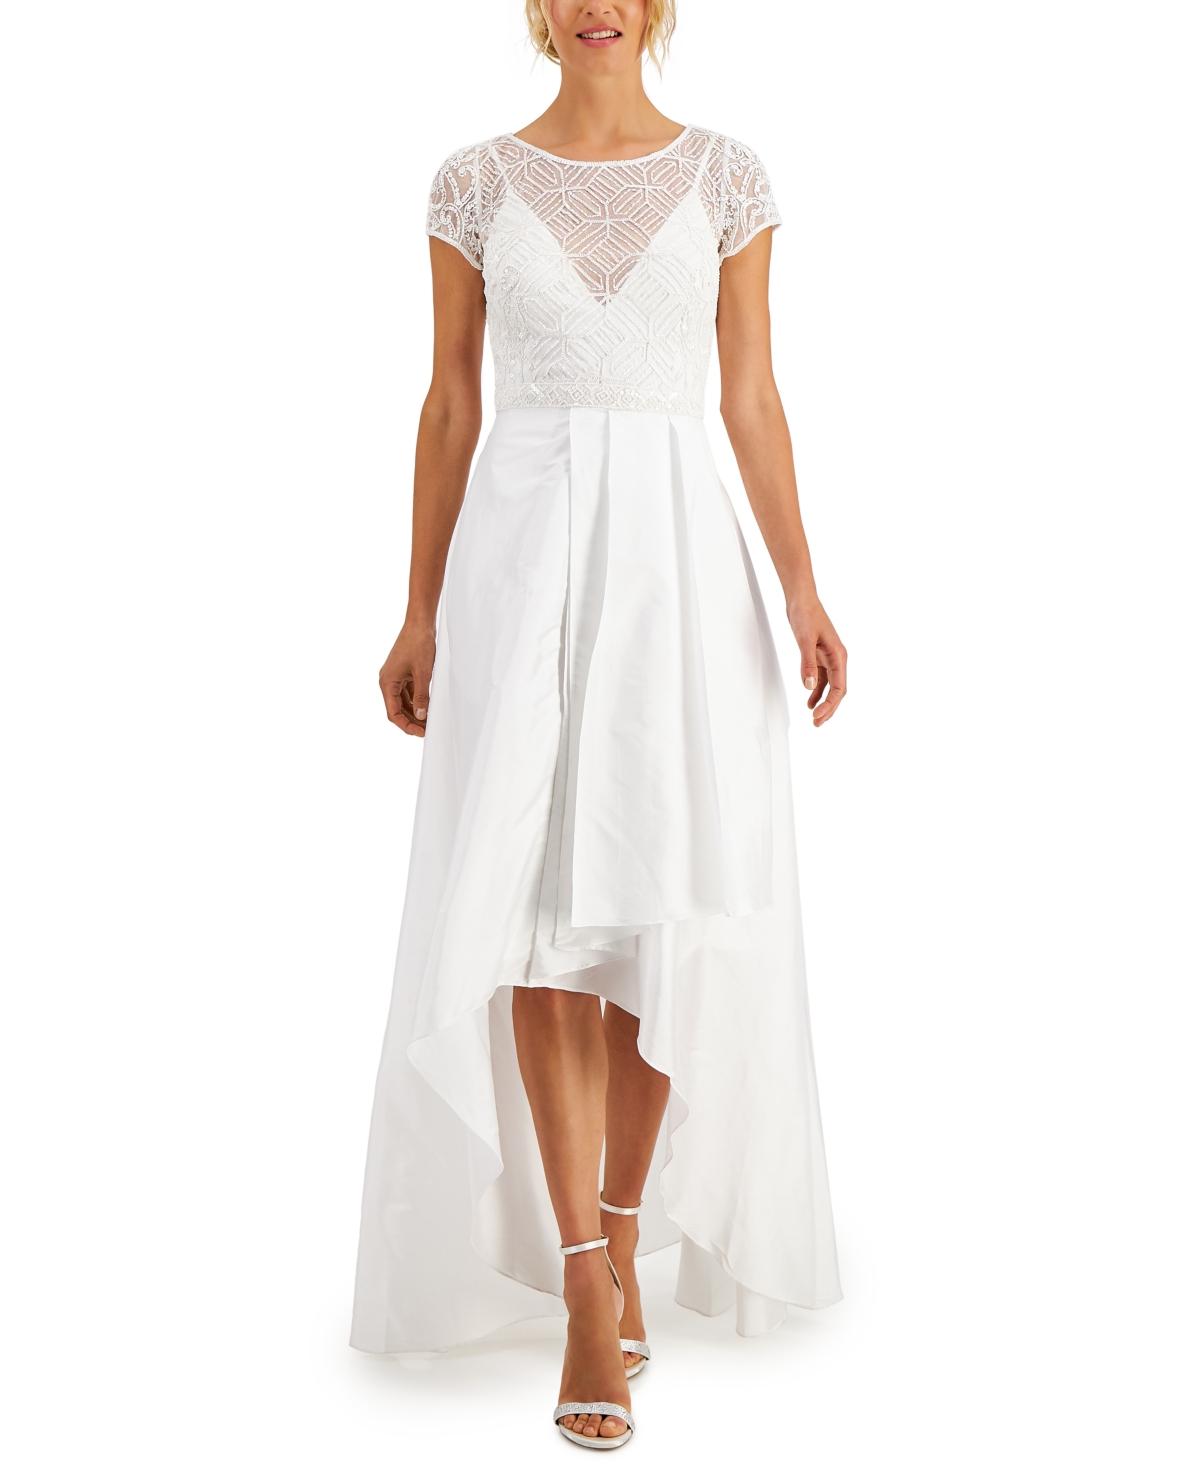 J Kara Embellished High-Low Dress